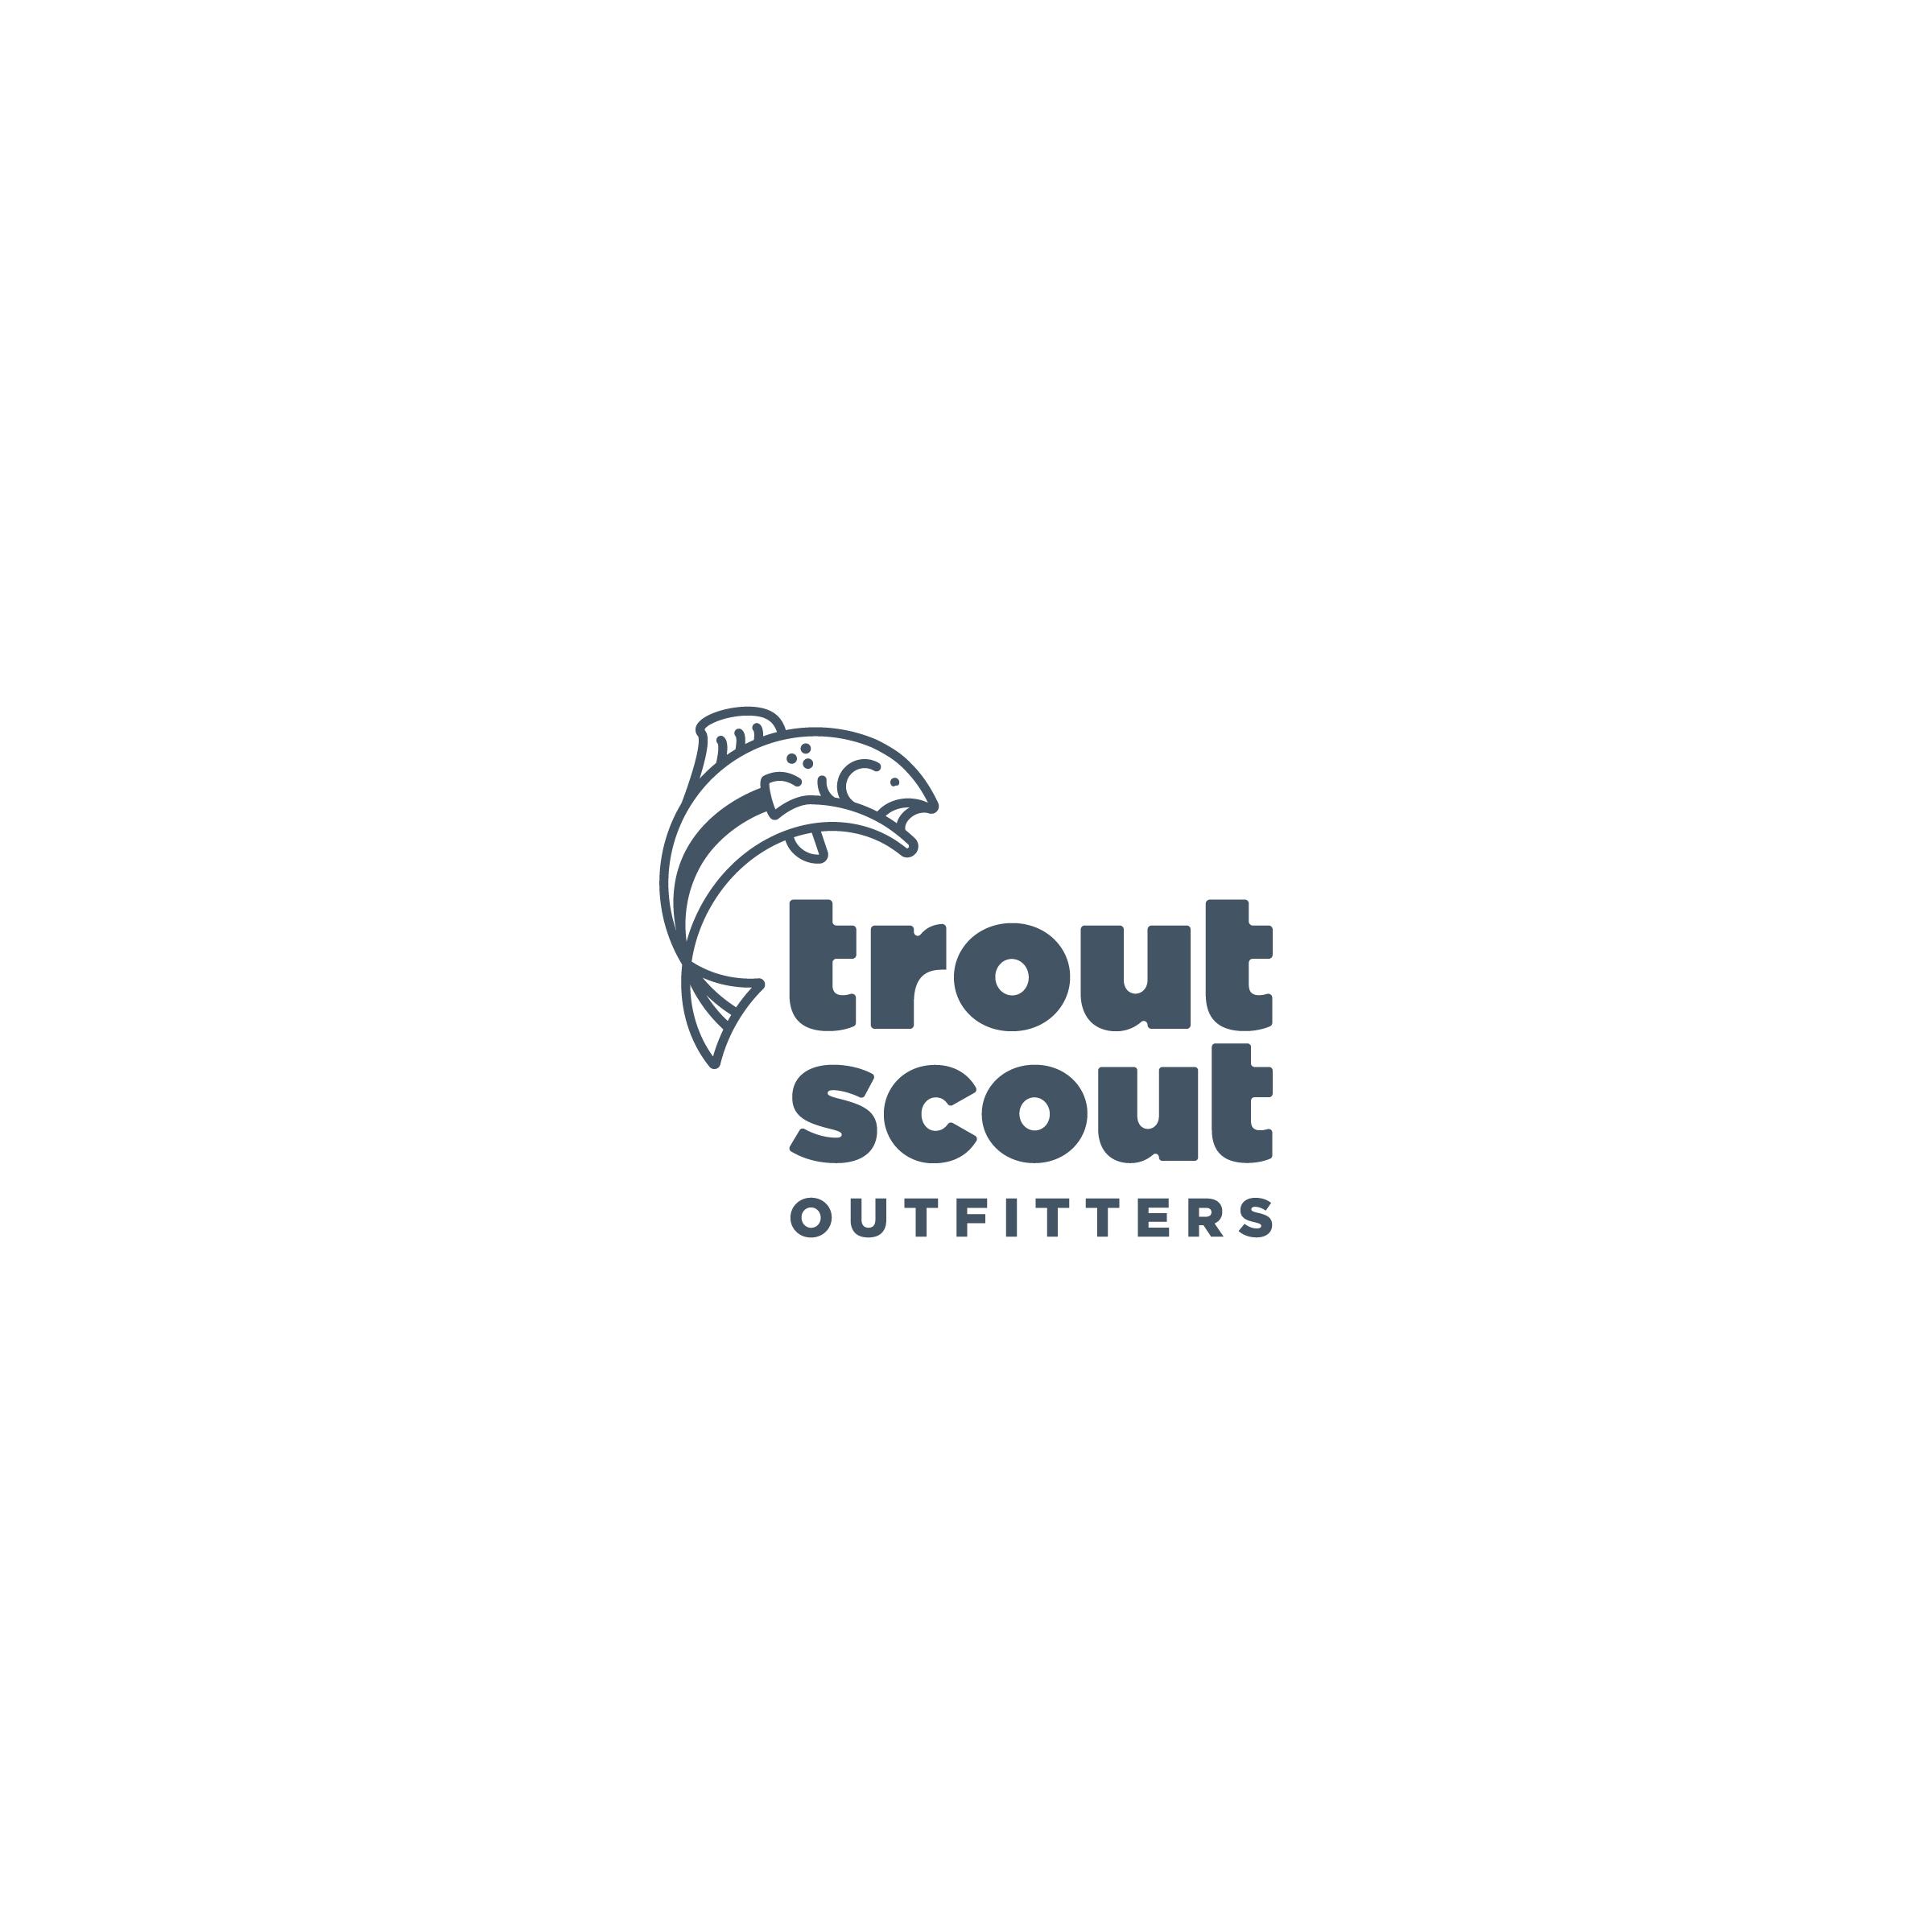 TroutScoutOutfitters_DkBlue_Vert.jpg